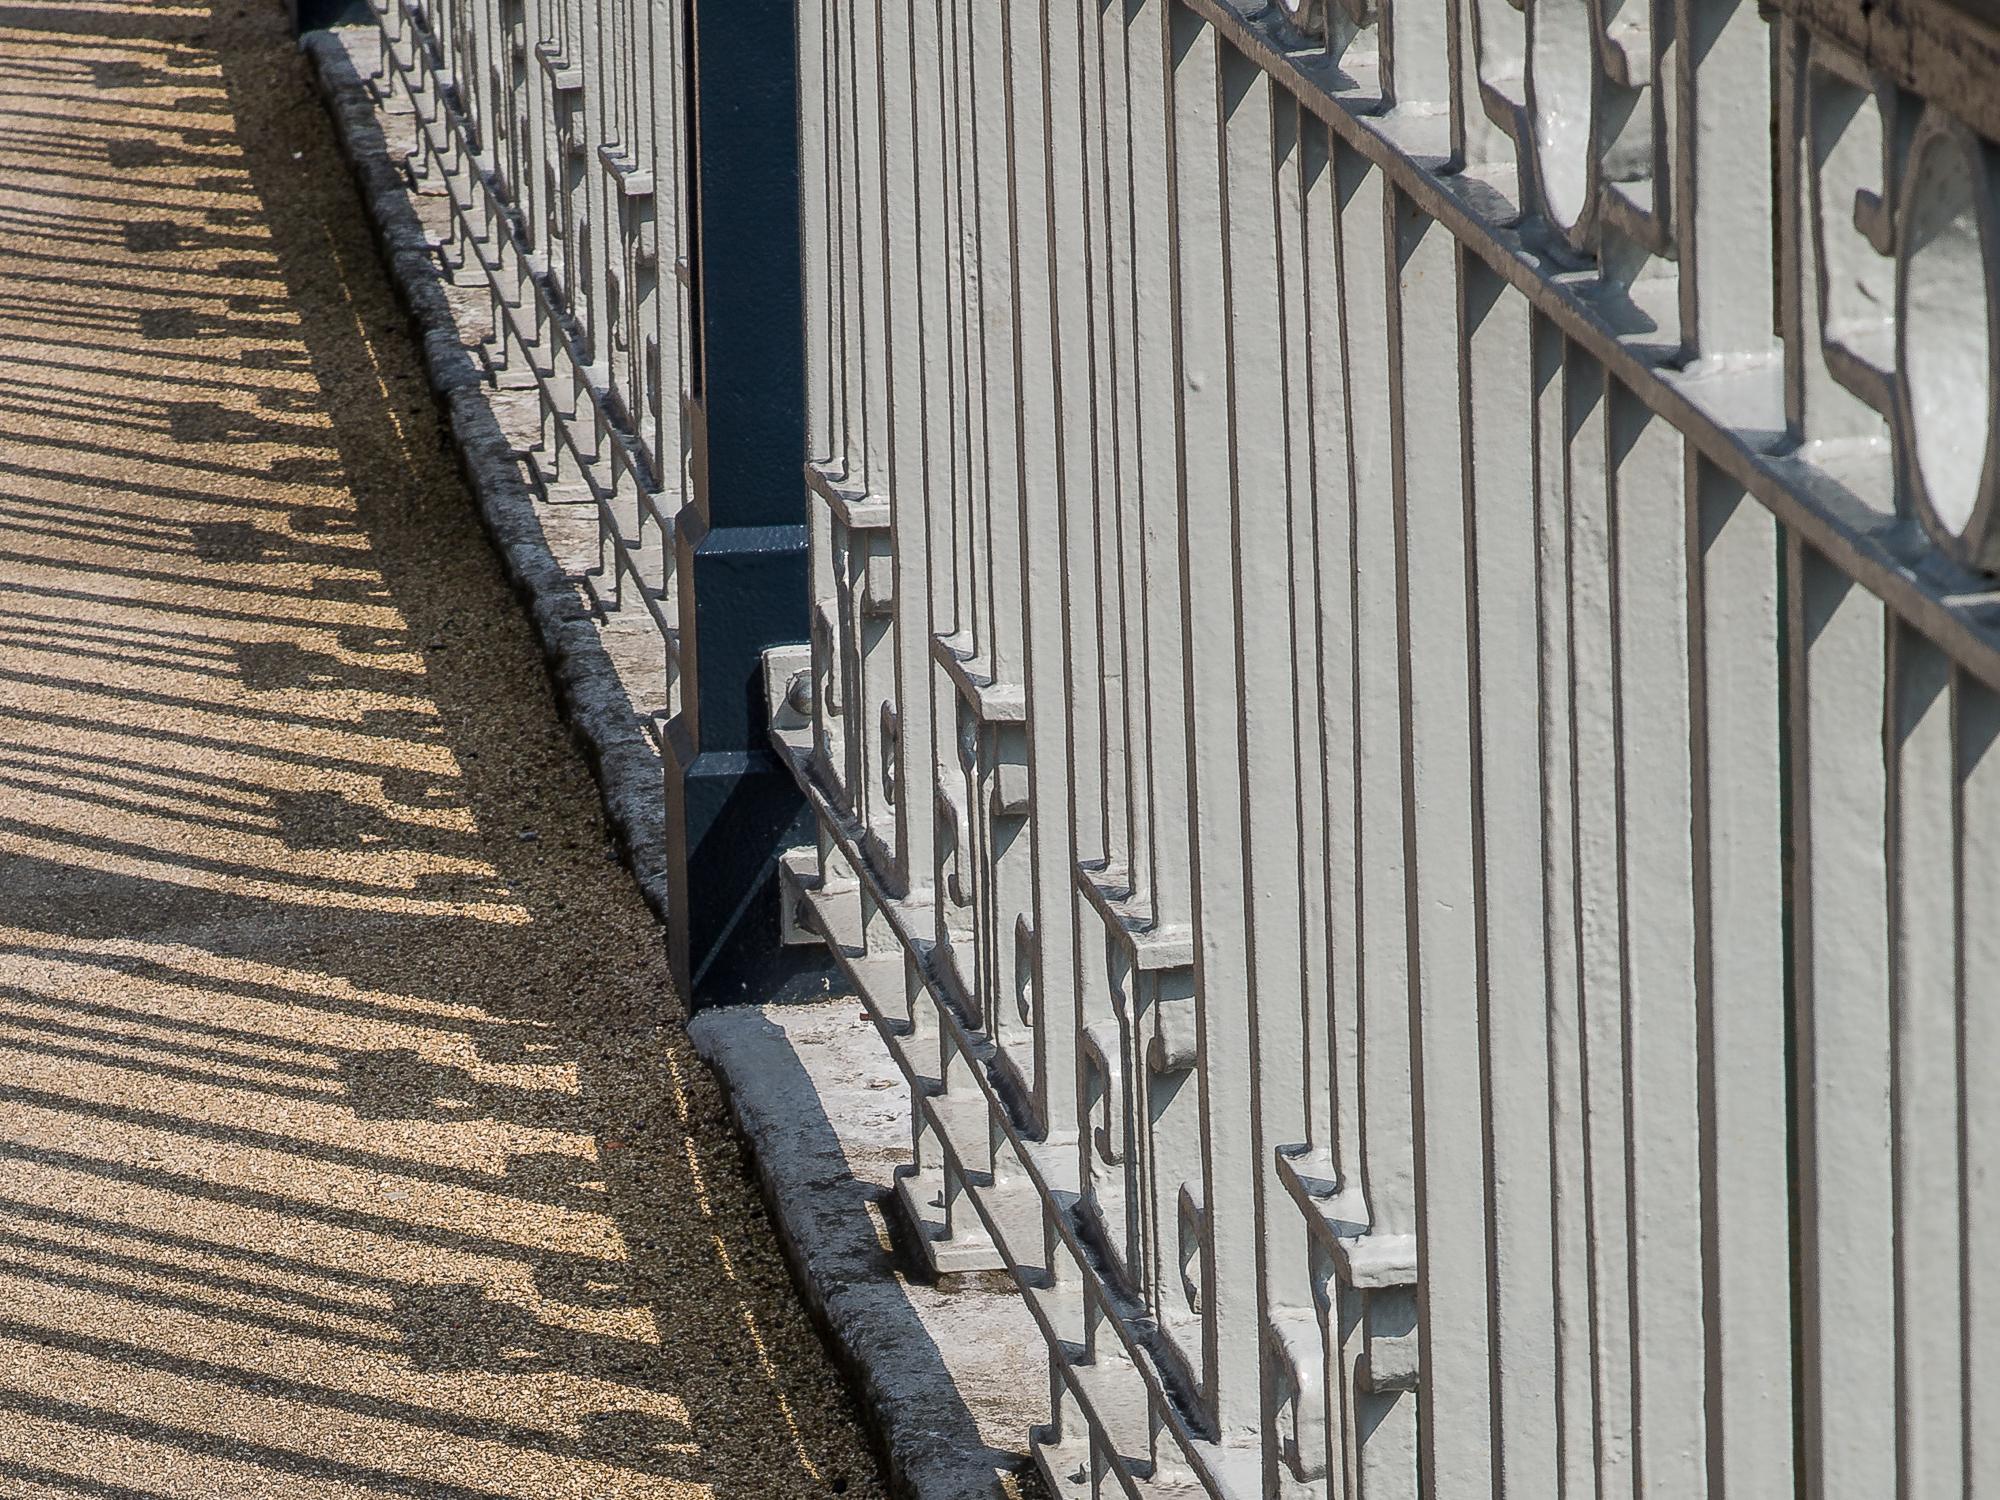 The railings of Brian Boru Bridge and their shadows make an interesting composition, Cork City Centre